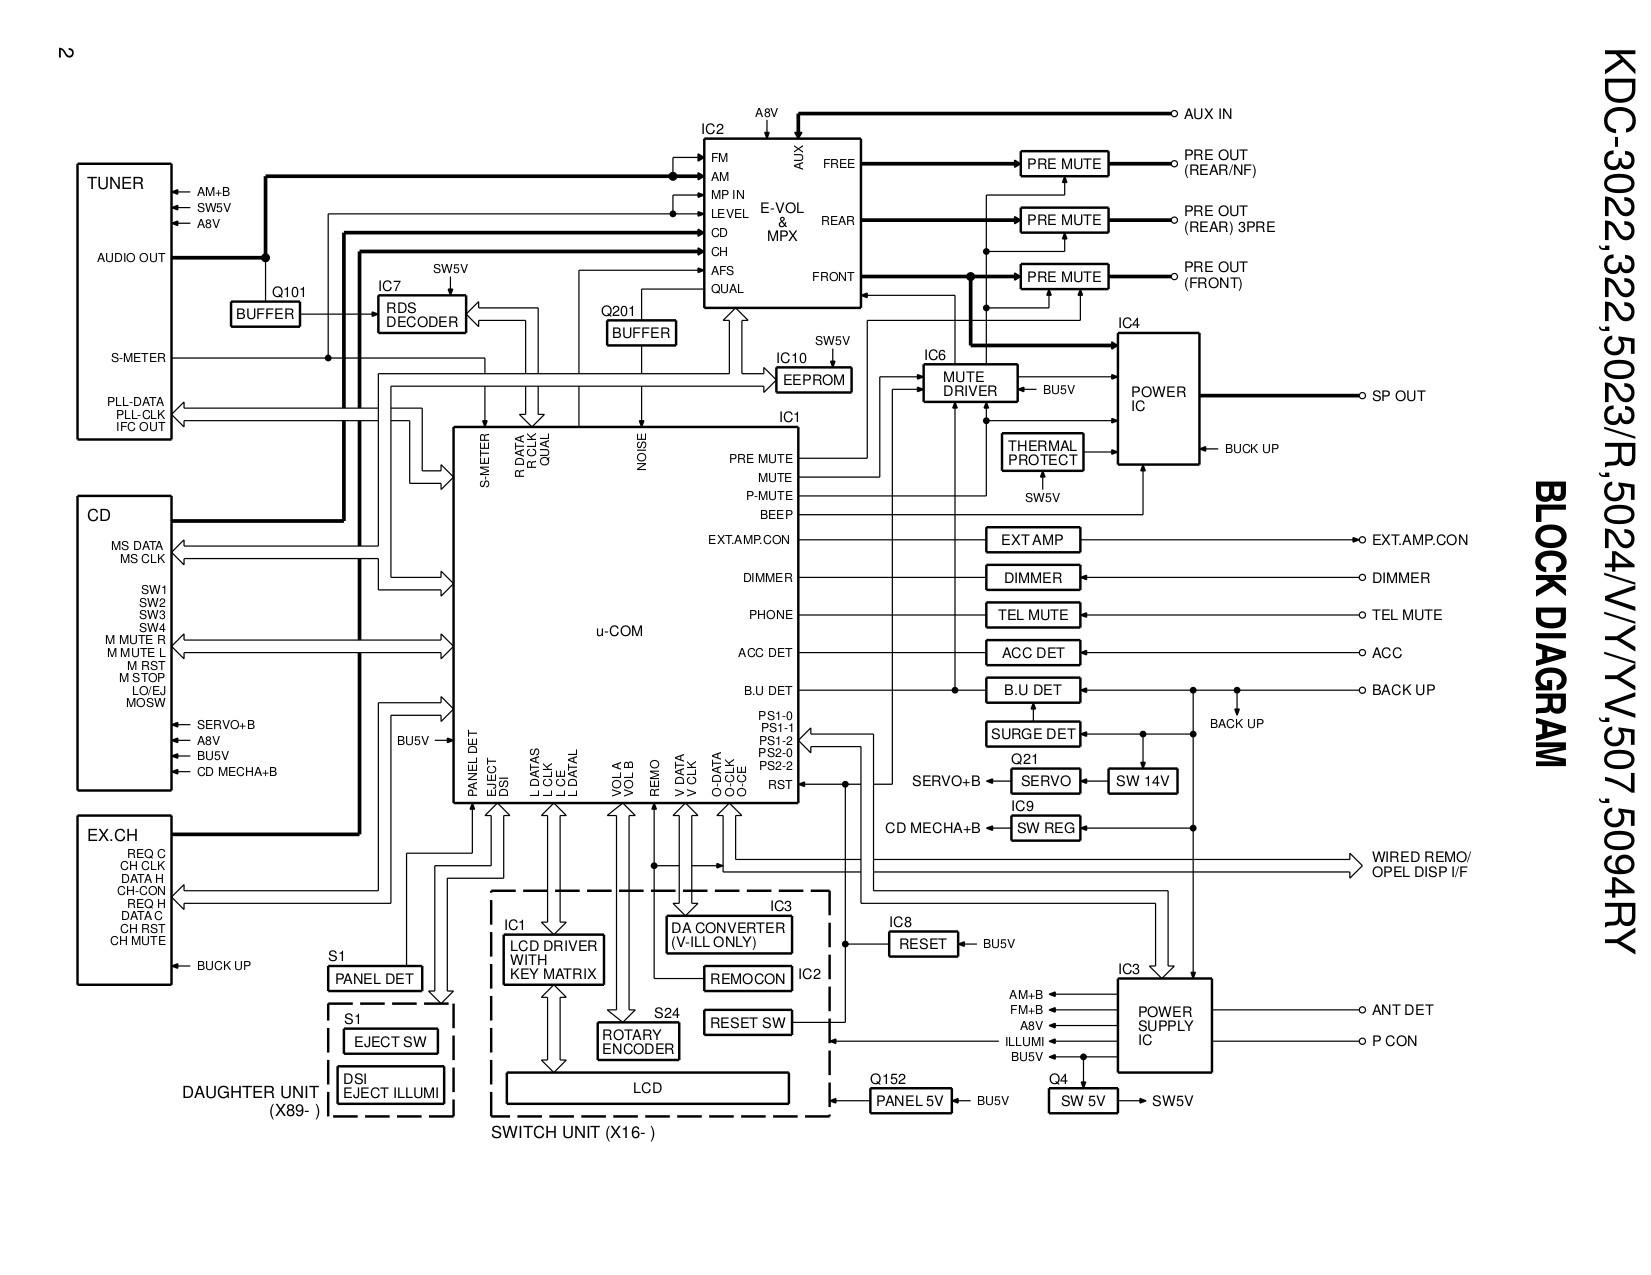 Kdc 255u Wiring Diagram 7bc56a Kenwood Kdc 255u Wiring Diagram Of Kdc 255u Wiring Diagram